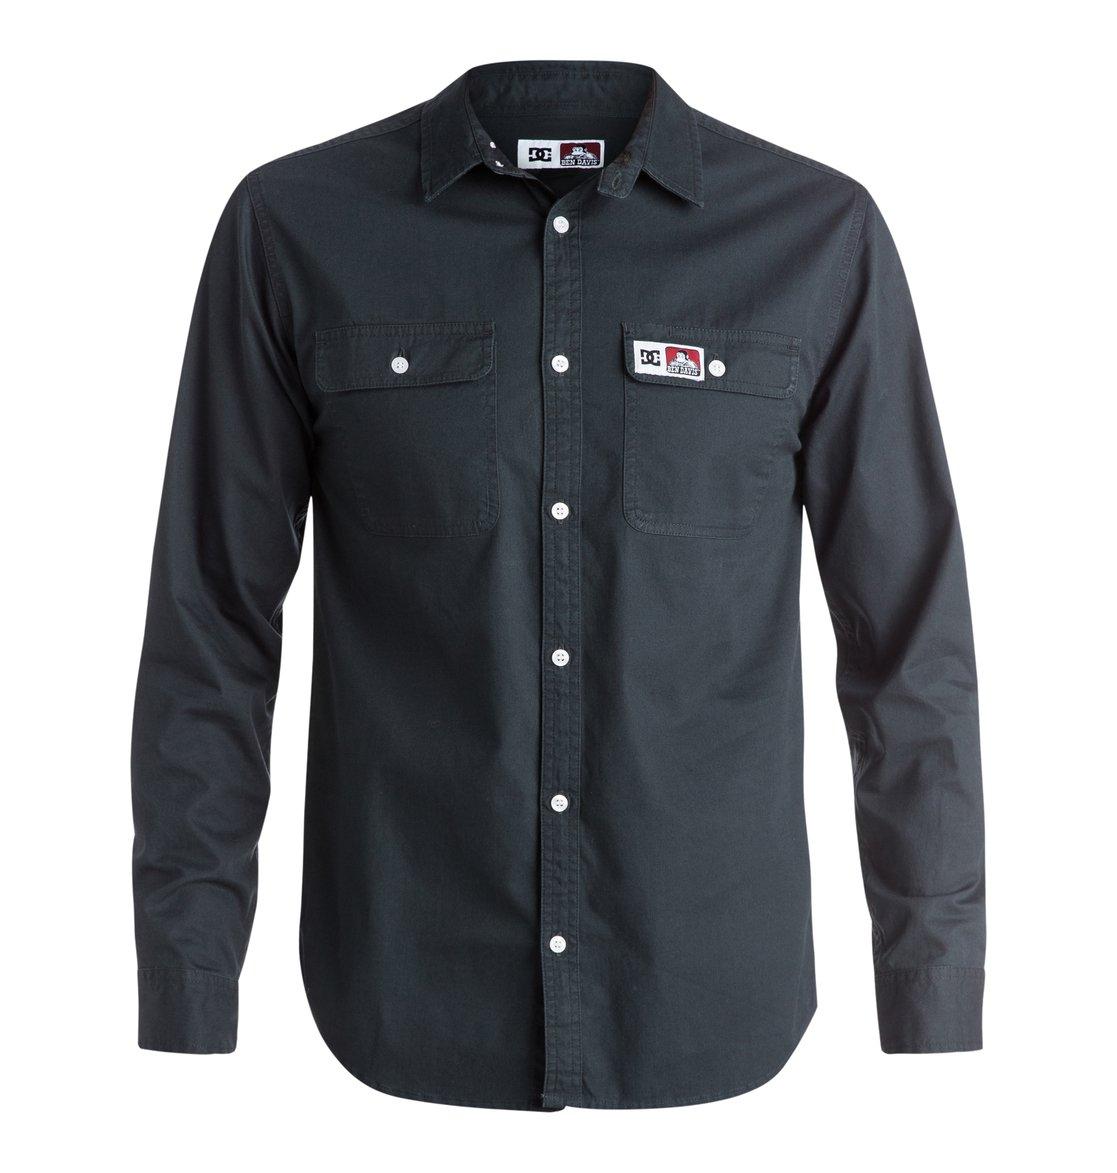 DCBD Twill - Long Sleeve Shirt